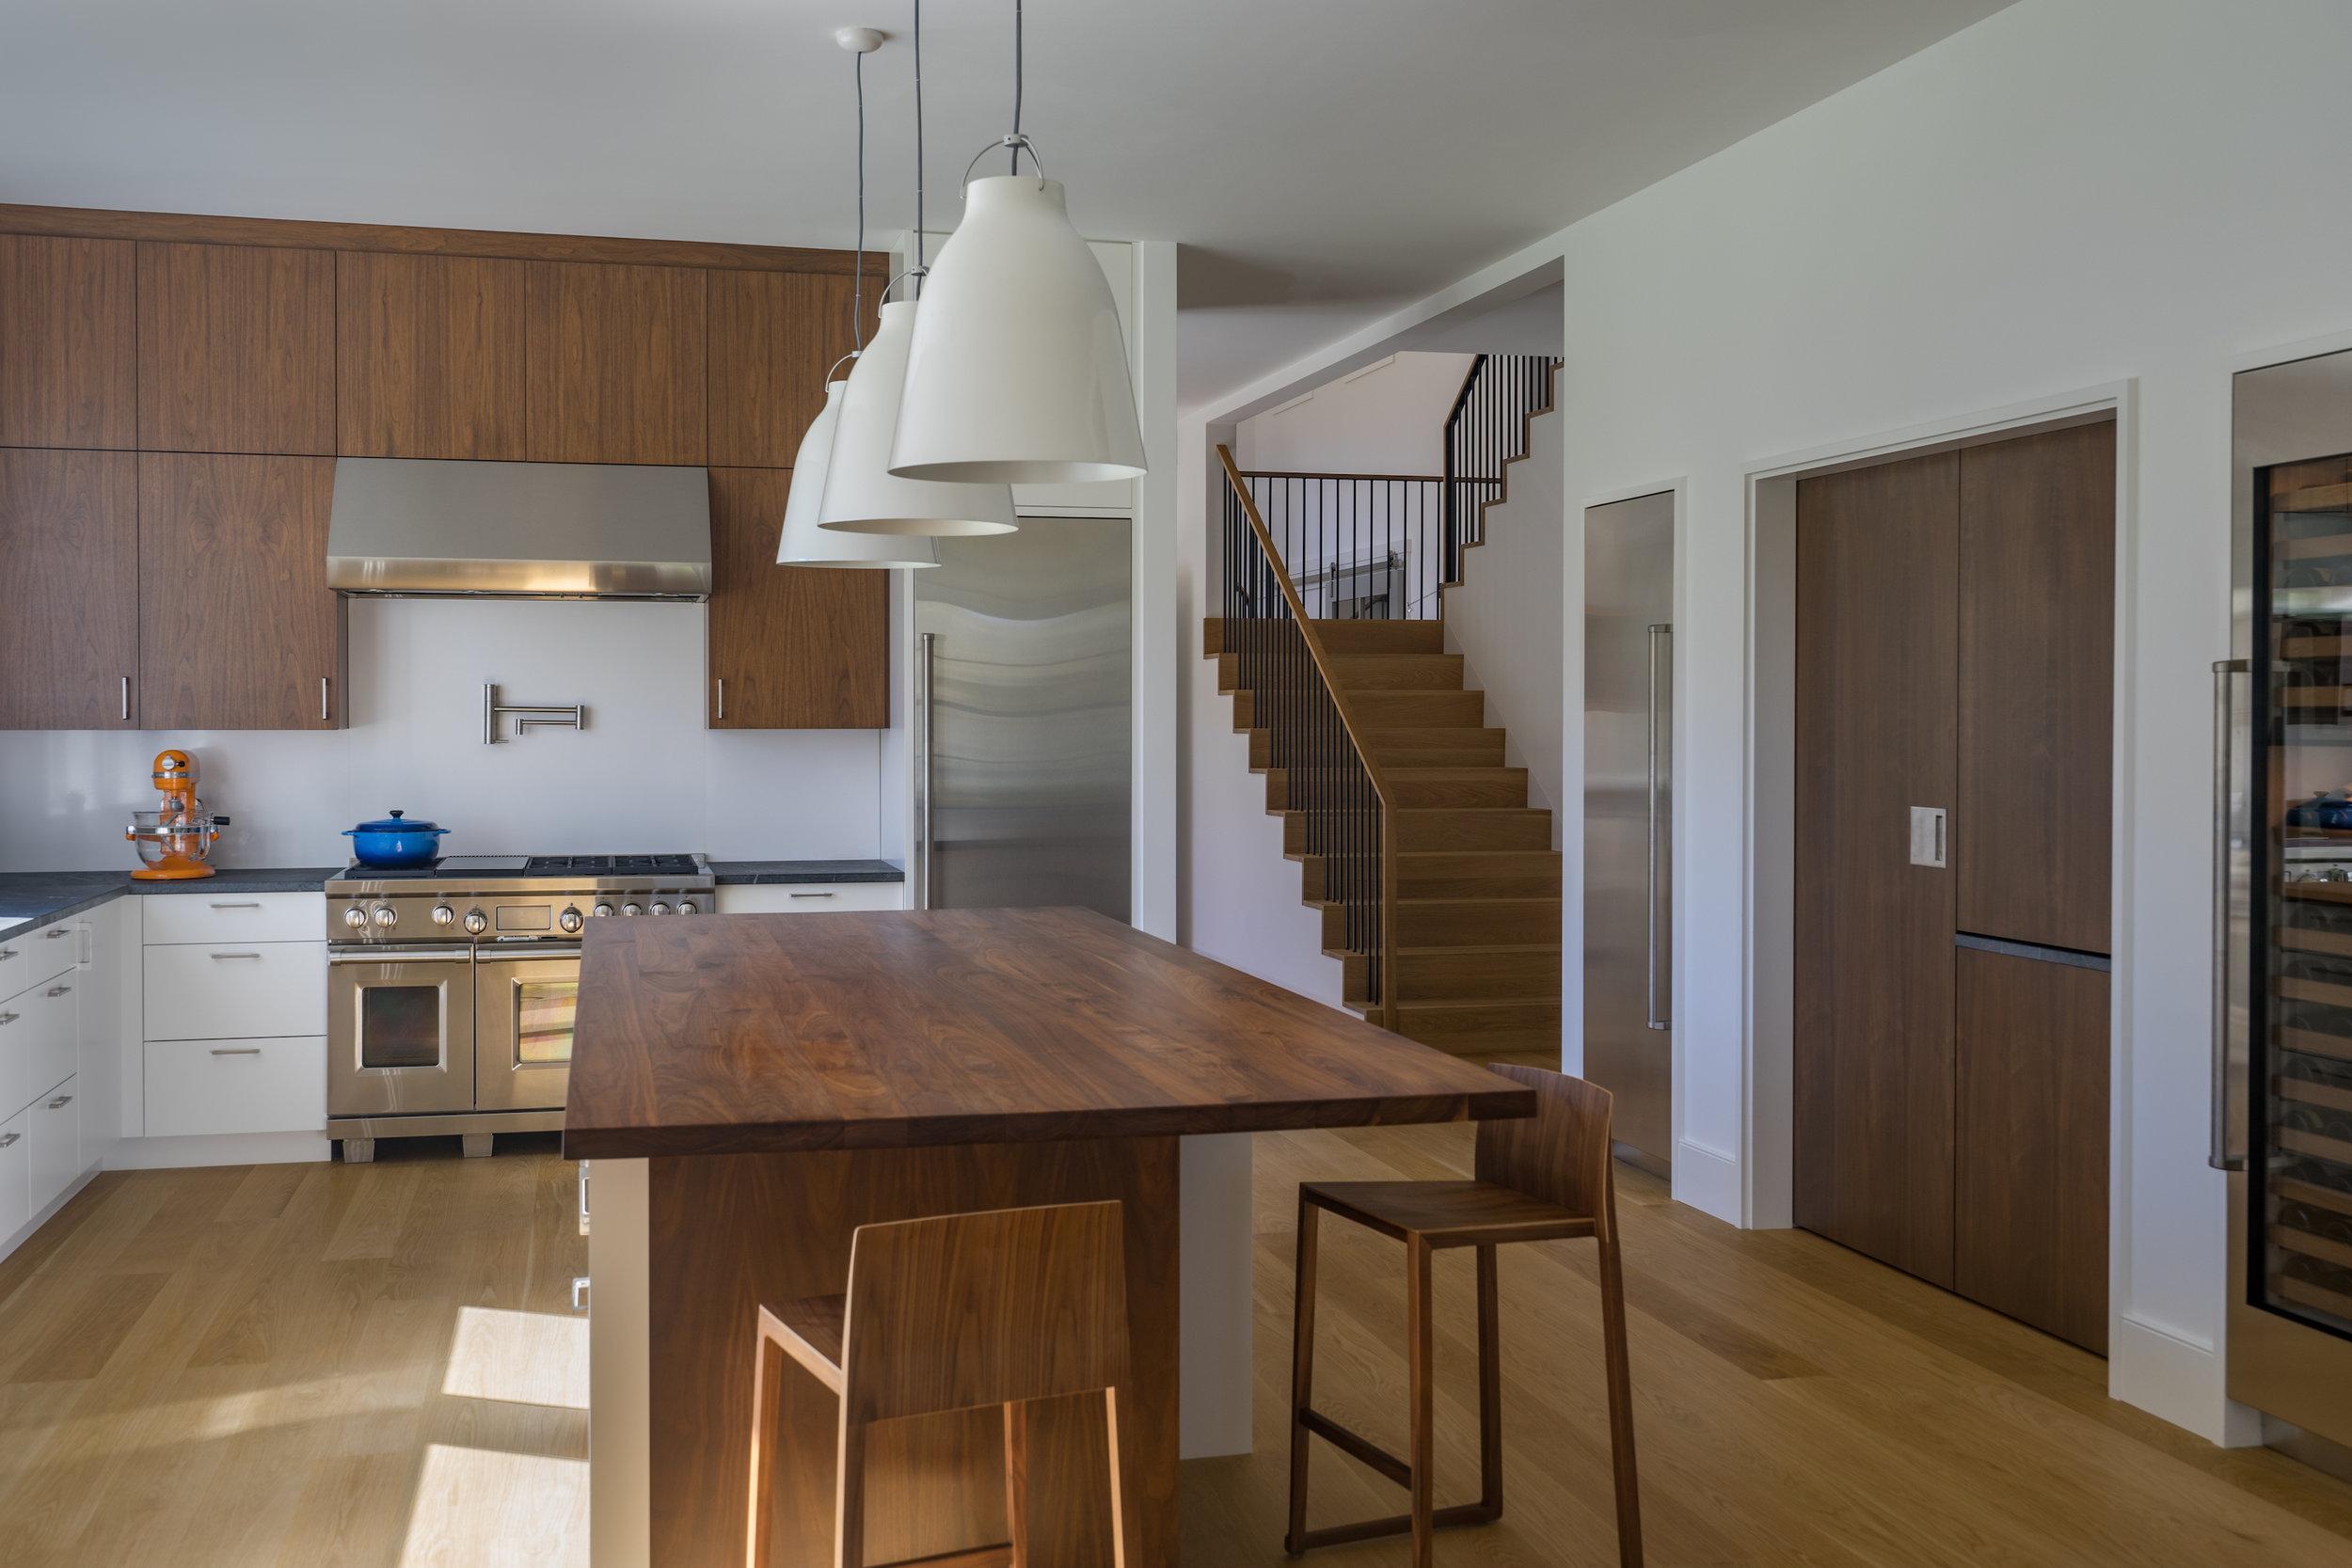 BDI Concord Kitchen Long View Resized for NKBA.jpg